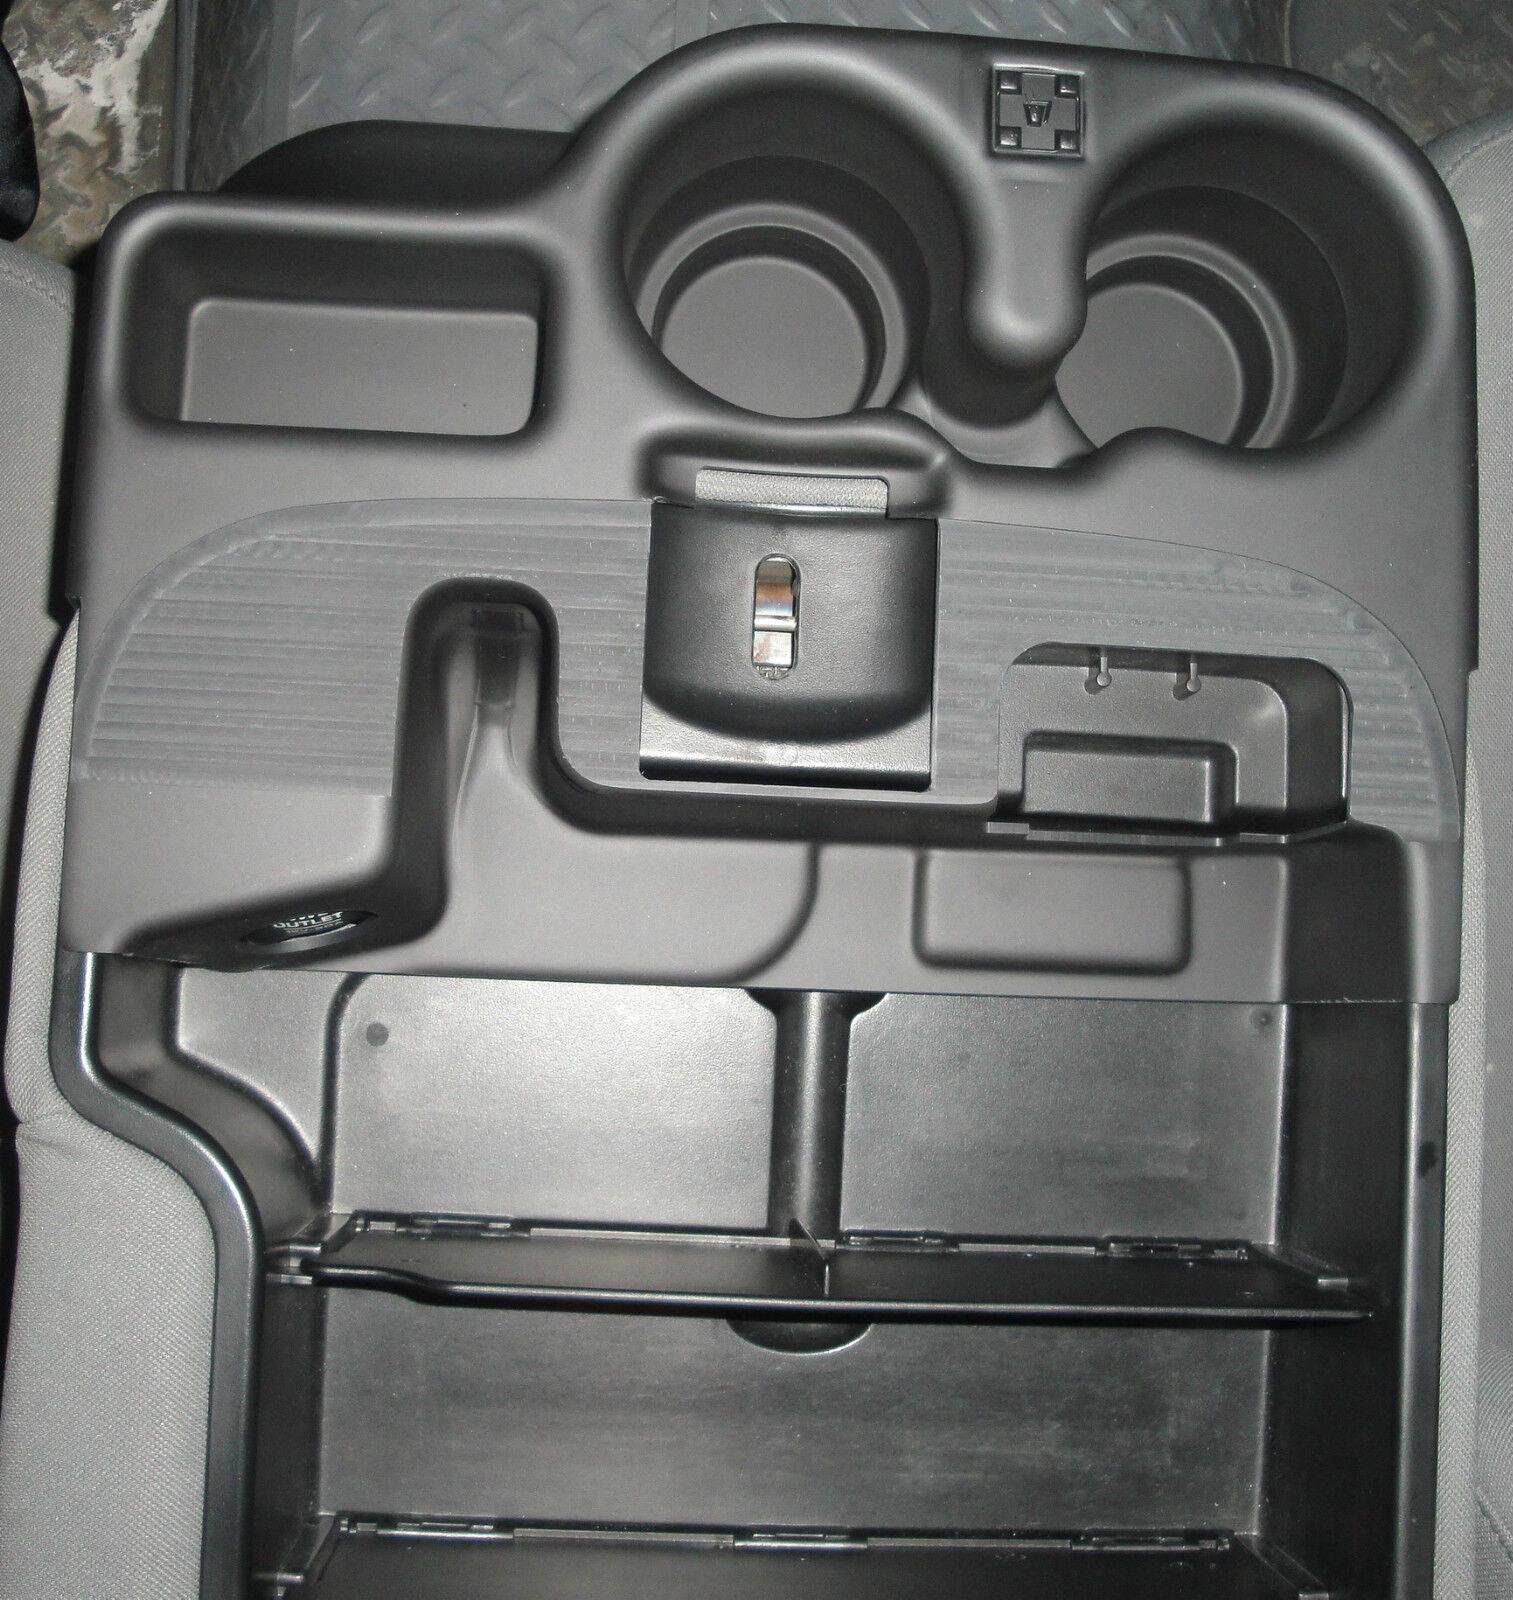 2003 dodge ram 1500 manual